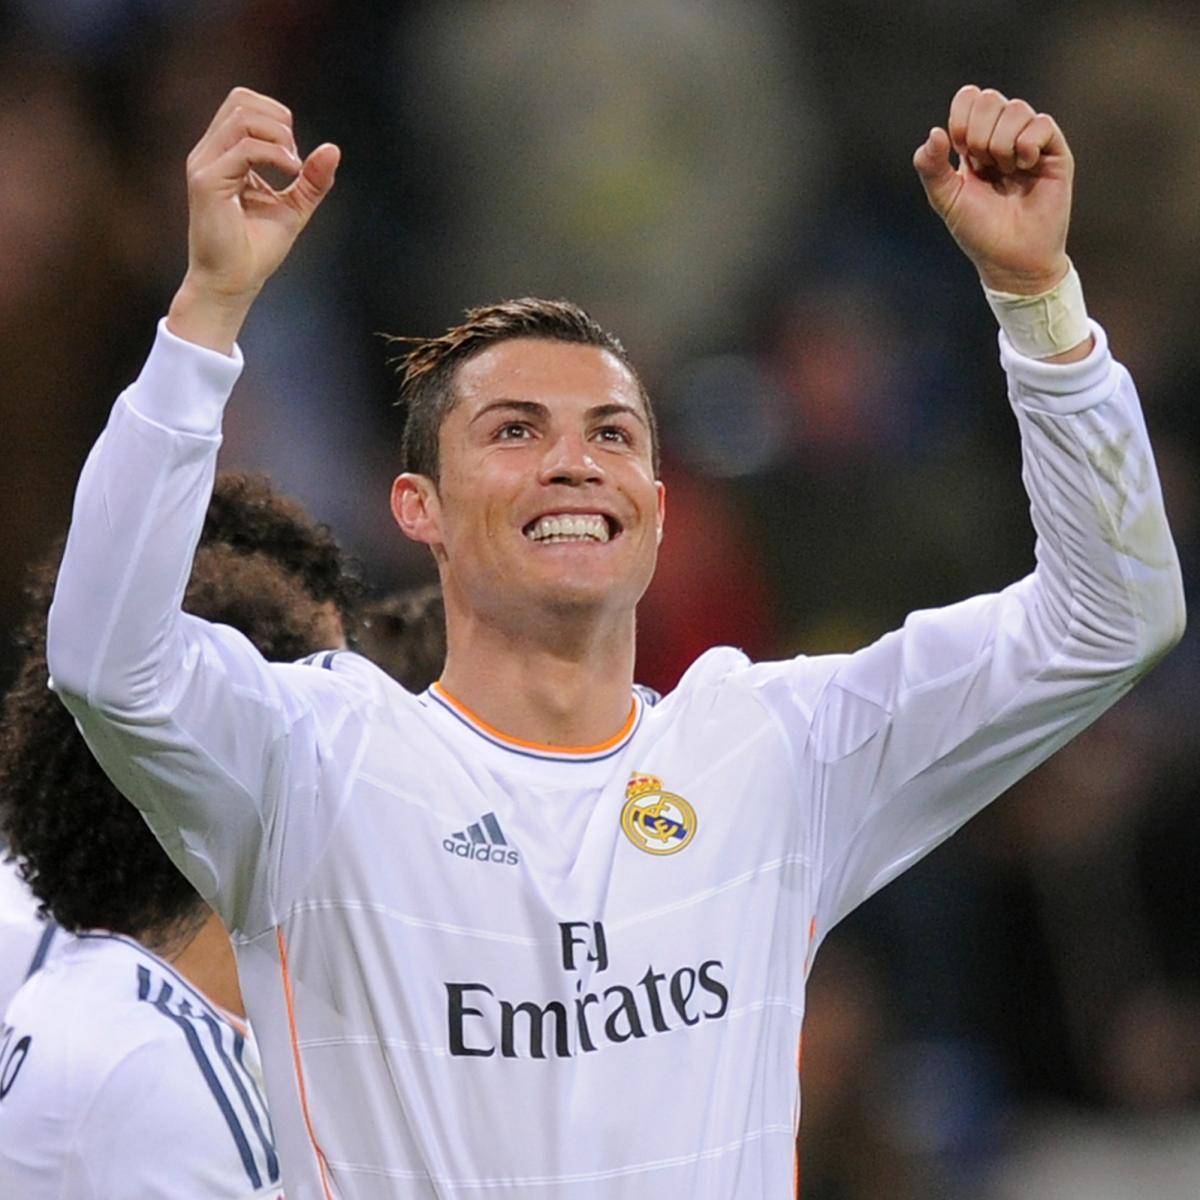 Cristiano Ronaldo S 4 Goals Lead Real Madrid To Win Vs: Osasuna Vs. Real Madrid: Score, Grades And Post-Match